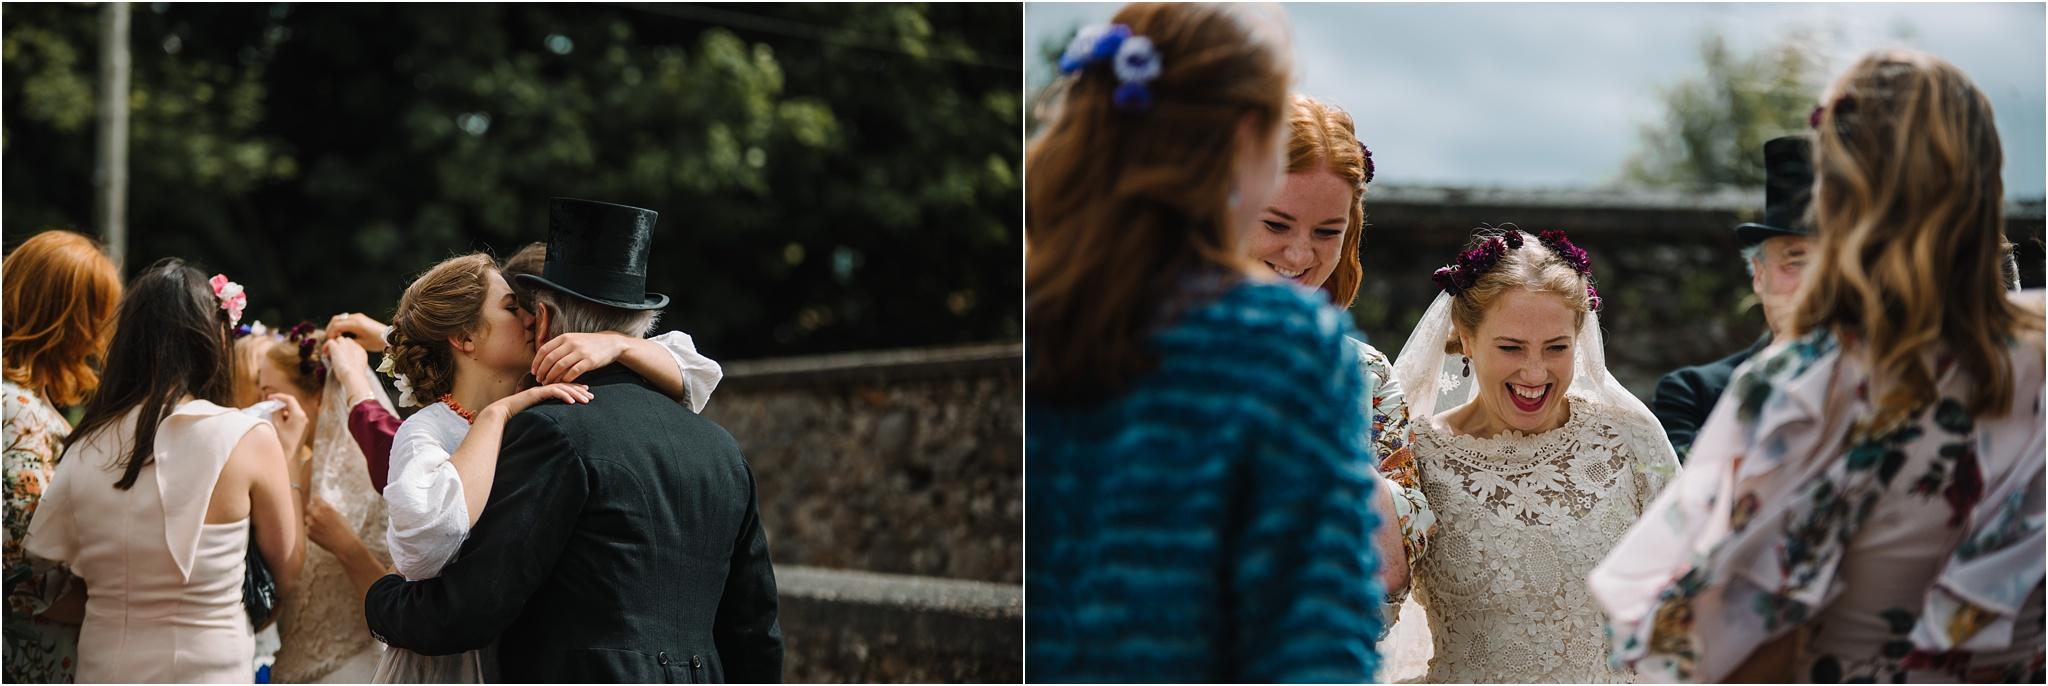 Outdoor-country-wedding-Edinburgh-photographer__0032.jpg